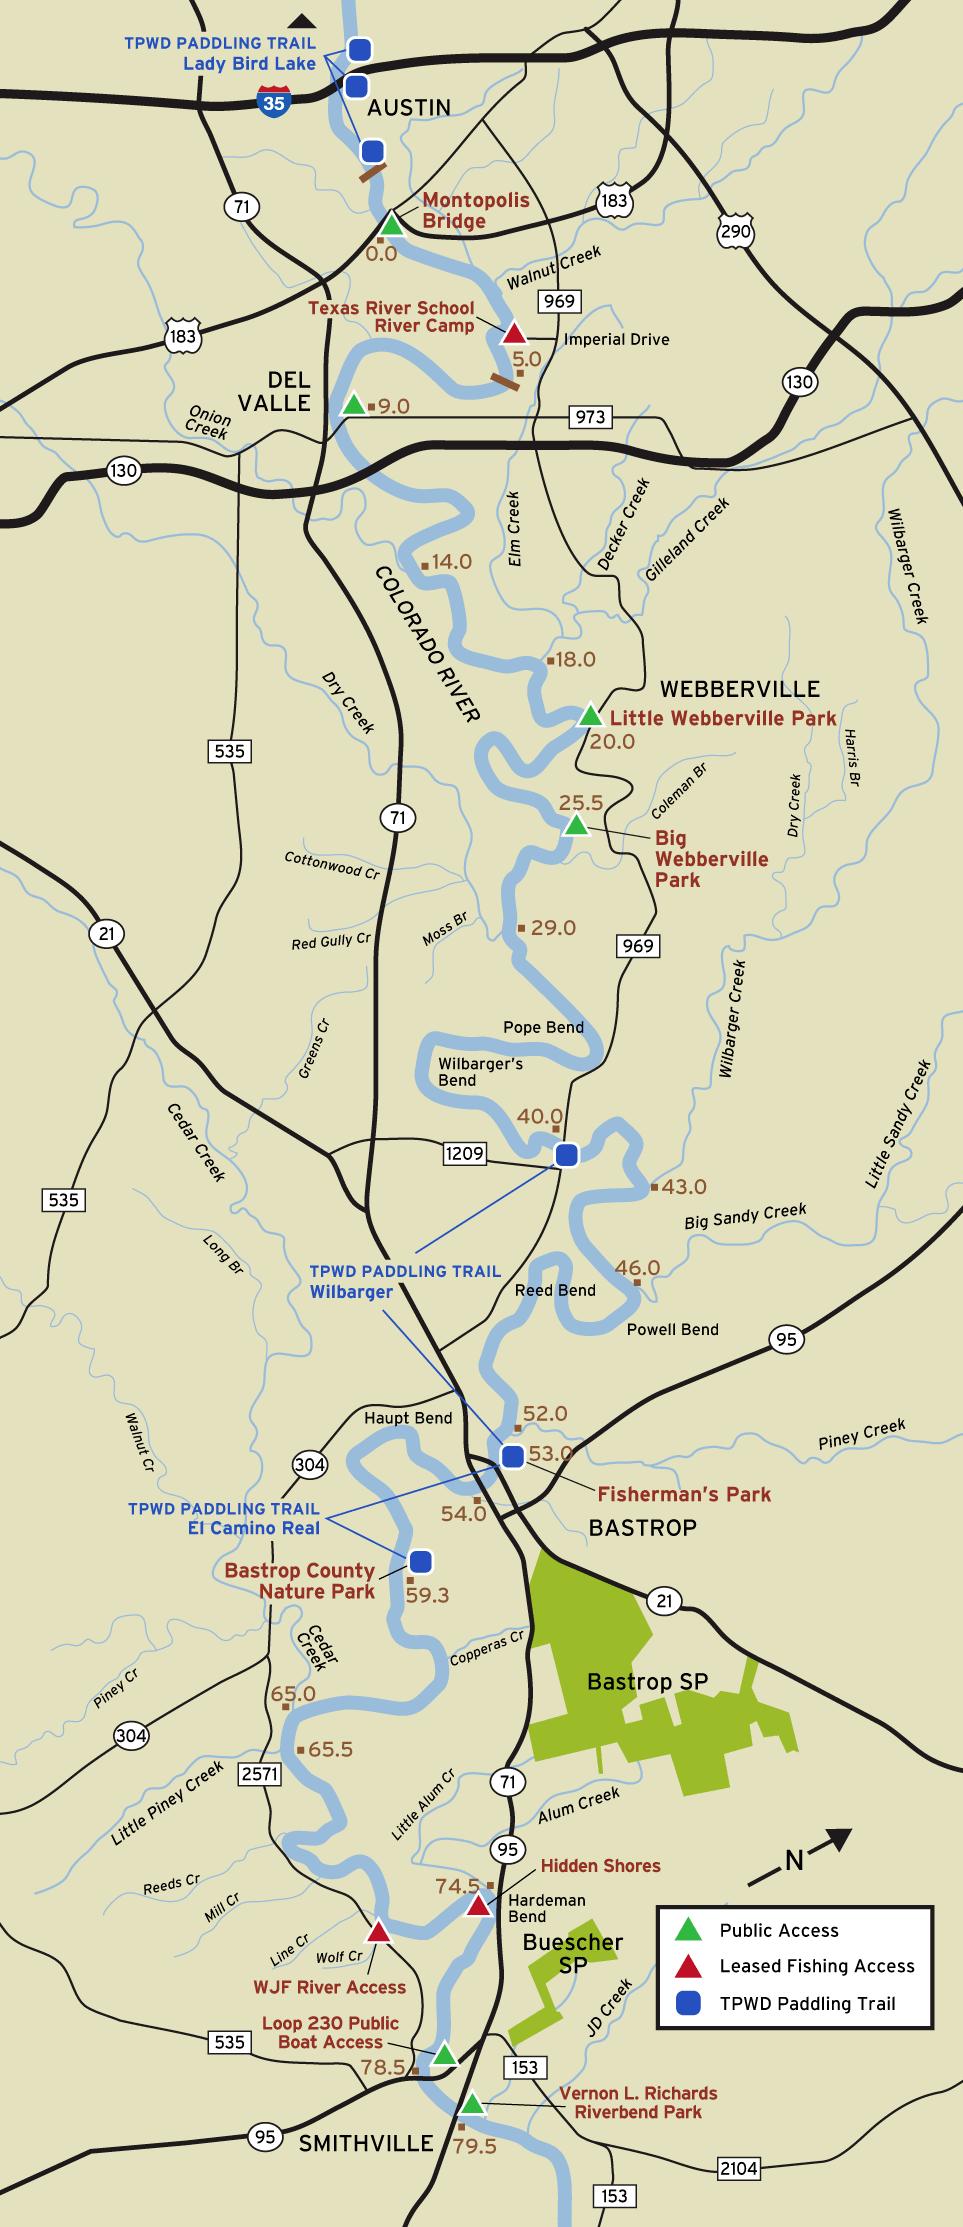 Colorado River Fishing Access - Map of colorado river in texas